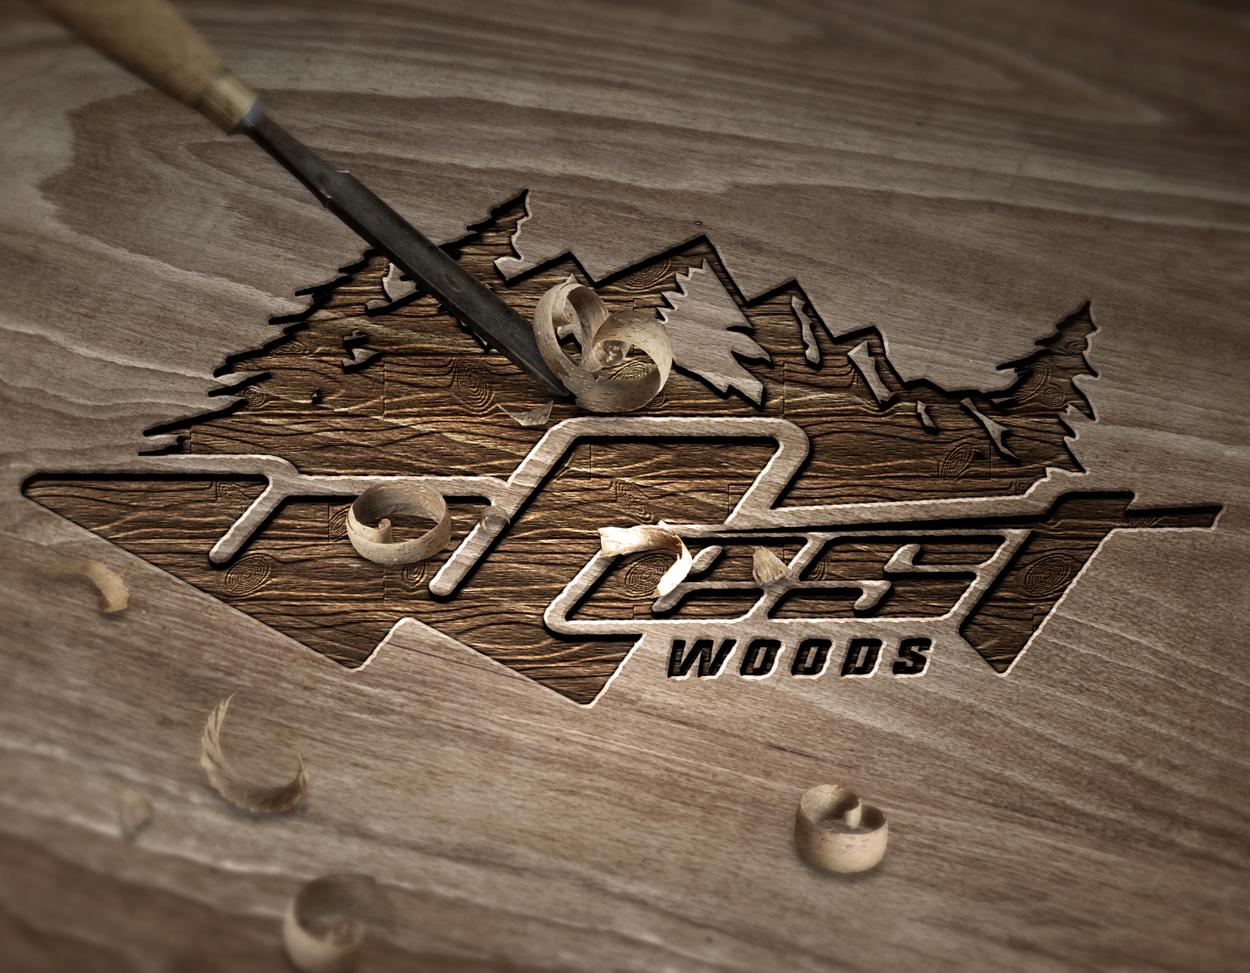 West Woods Canadian Motorcycle Logo Design